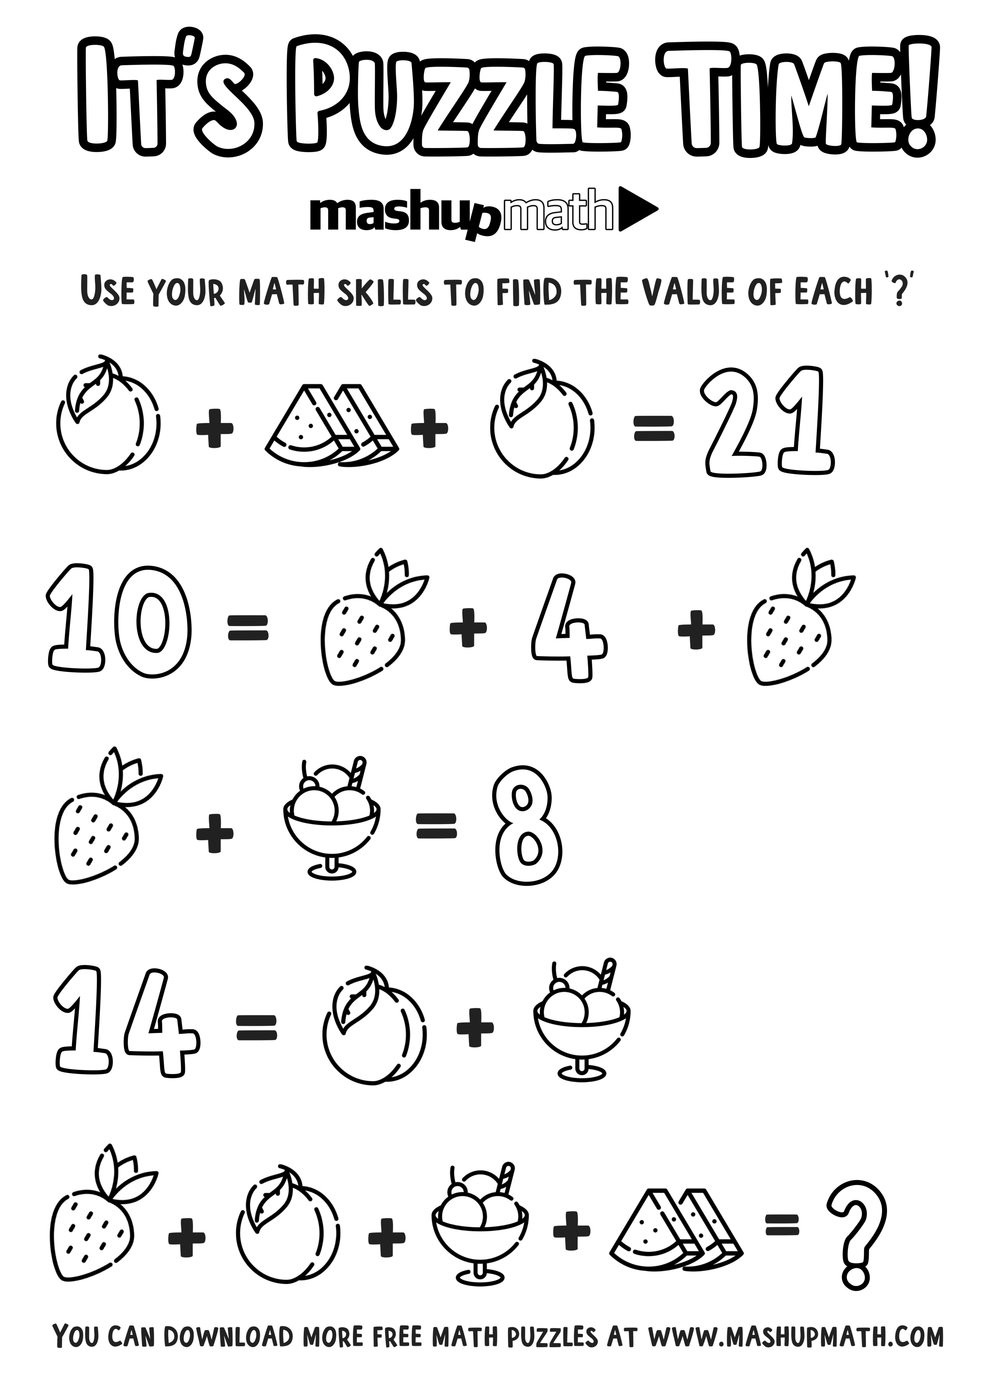 6th Grade Math Puzzles Worksheets Free Math Coloring Worksheets for 5th and 6th Grade — Mashup